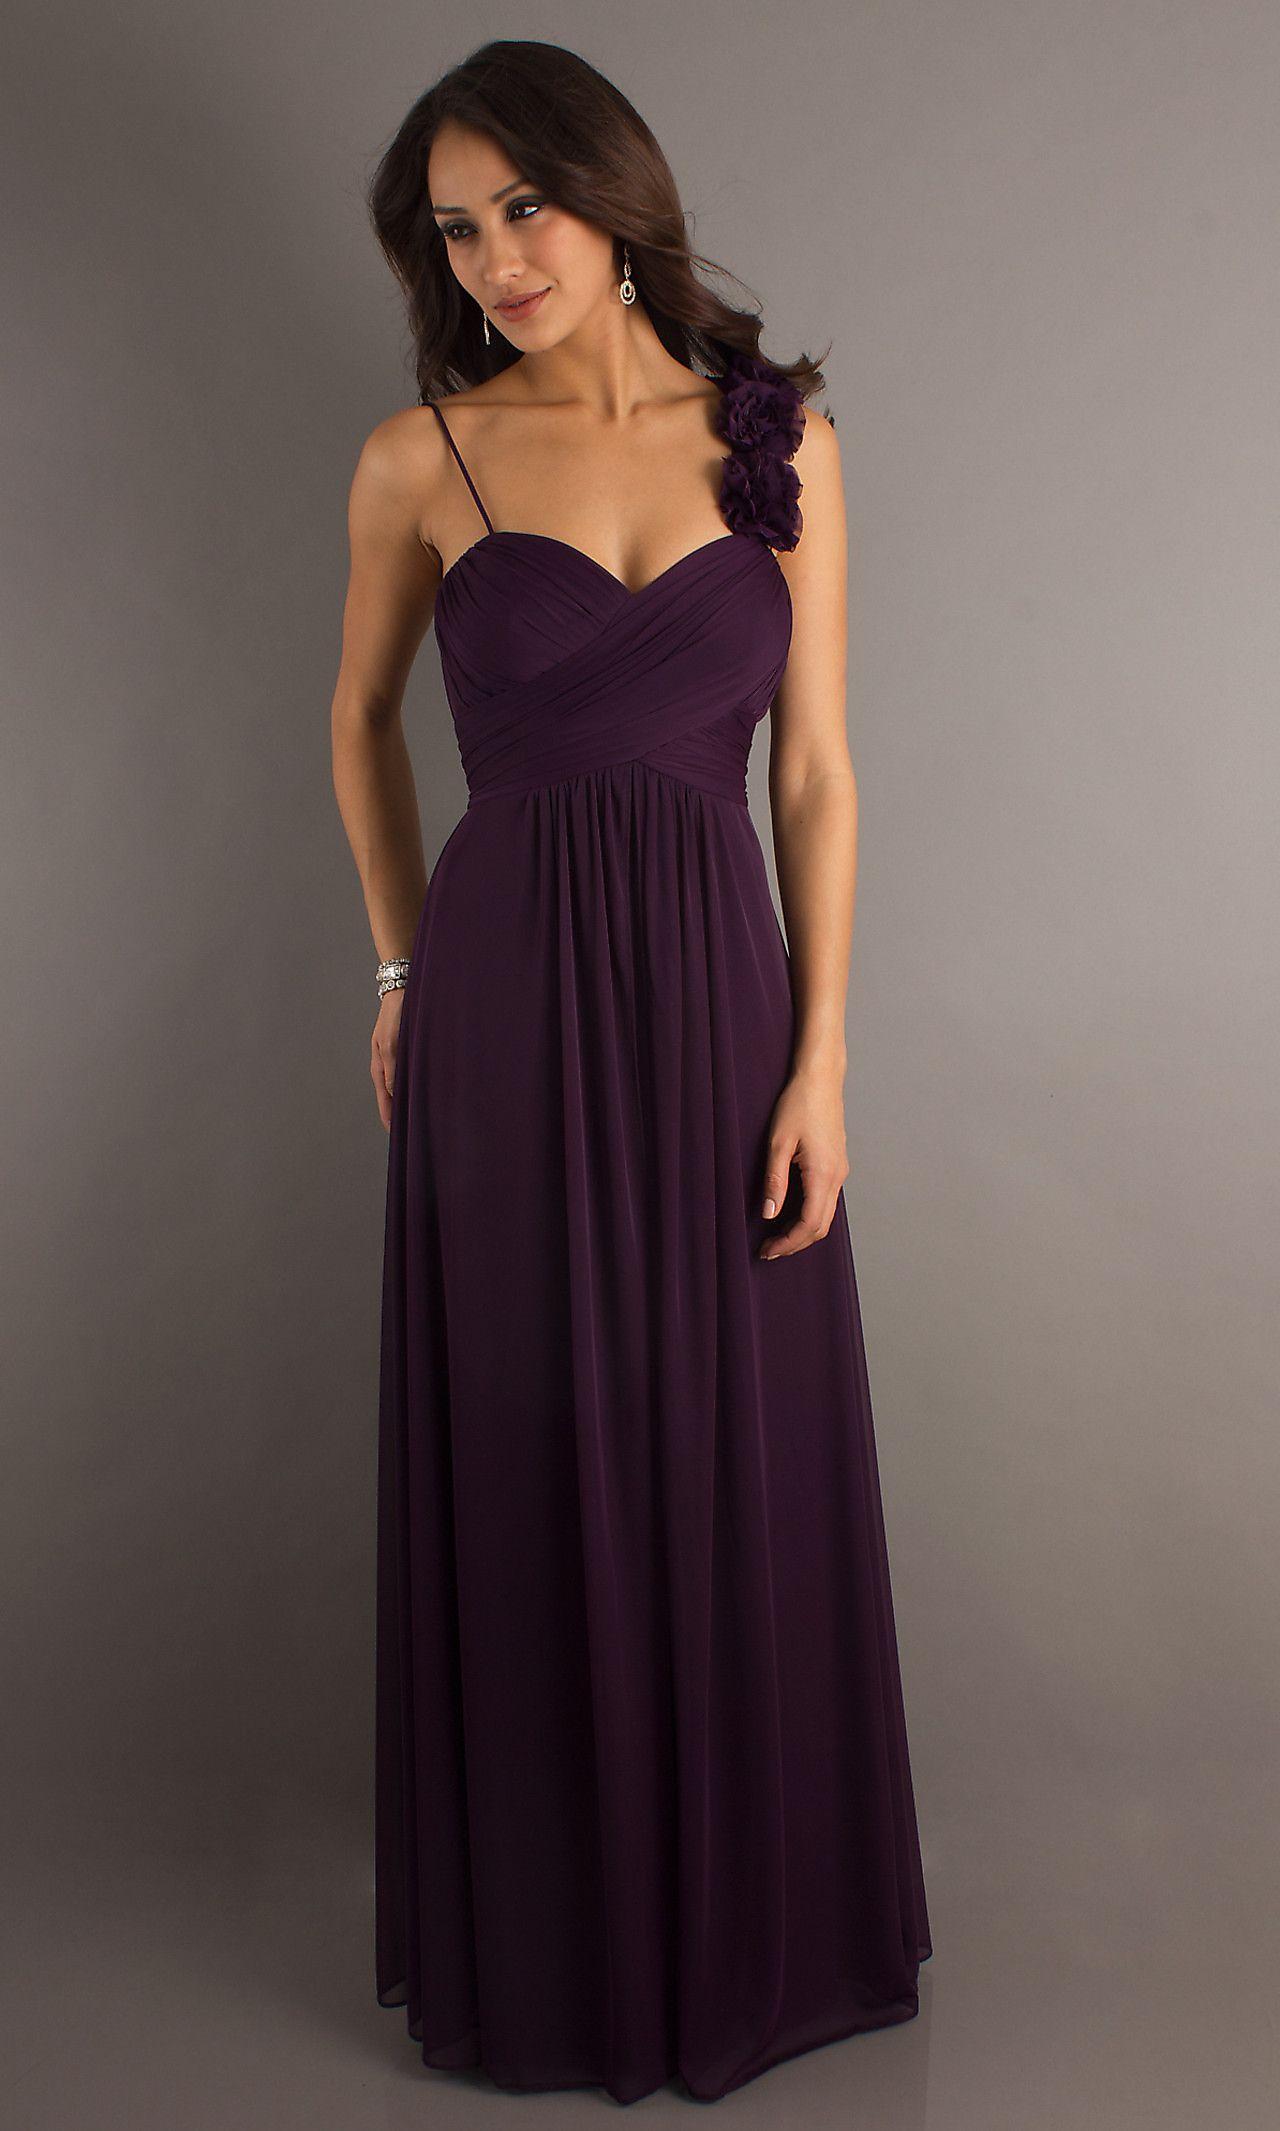 Long plum formal dress.   Wedding Idea\'s   Pinterest   Festliche ...